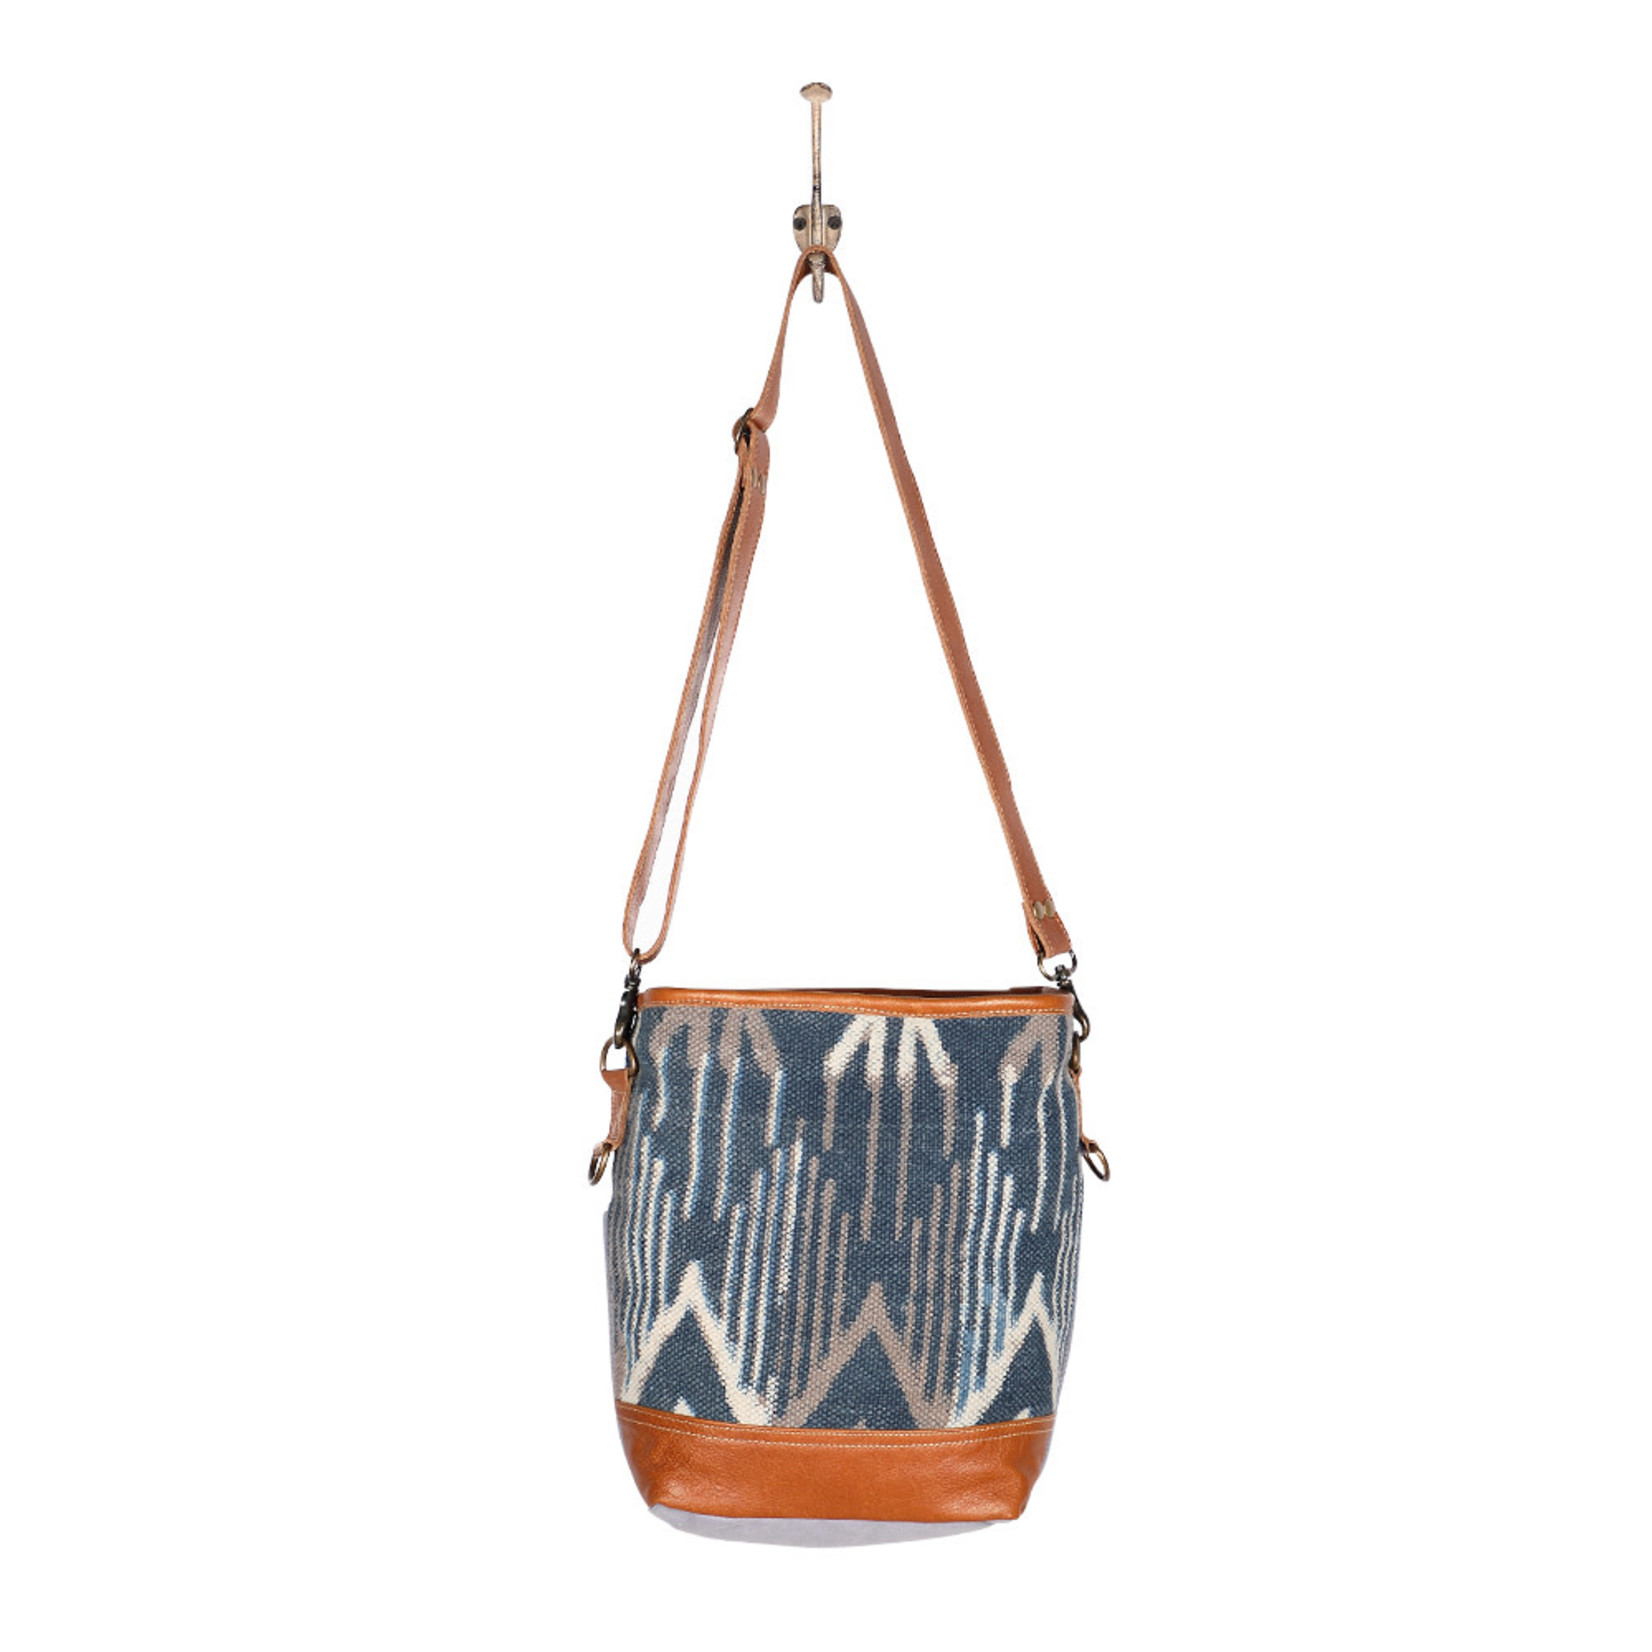 Myra Bags S-1954 Blue Mist Shoulder Bag